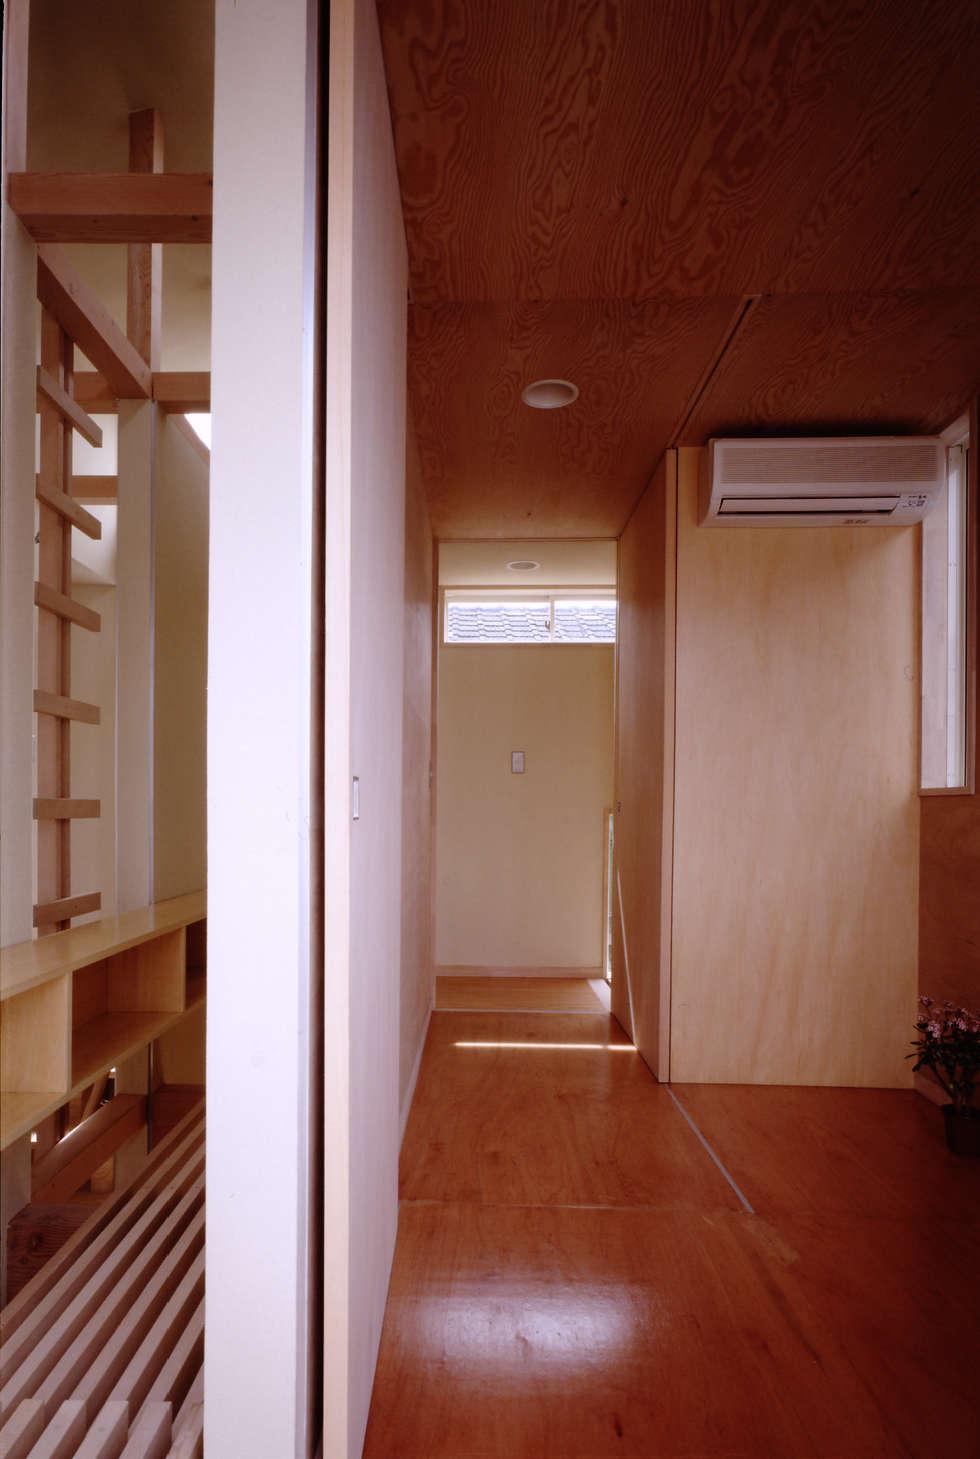 TAN 子供室: 濱嵜良実+株式会社 浜﨑工務店一級建築士事務所が手掛けた子供部屋です。